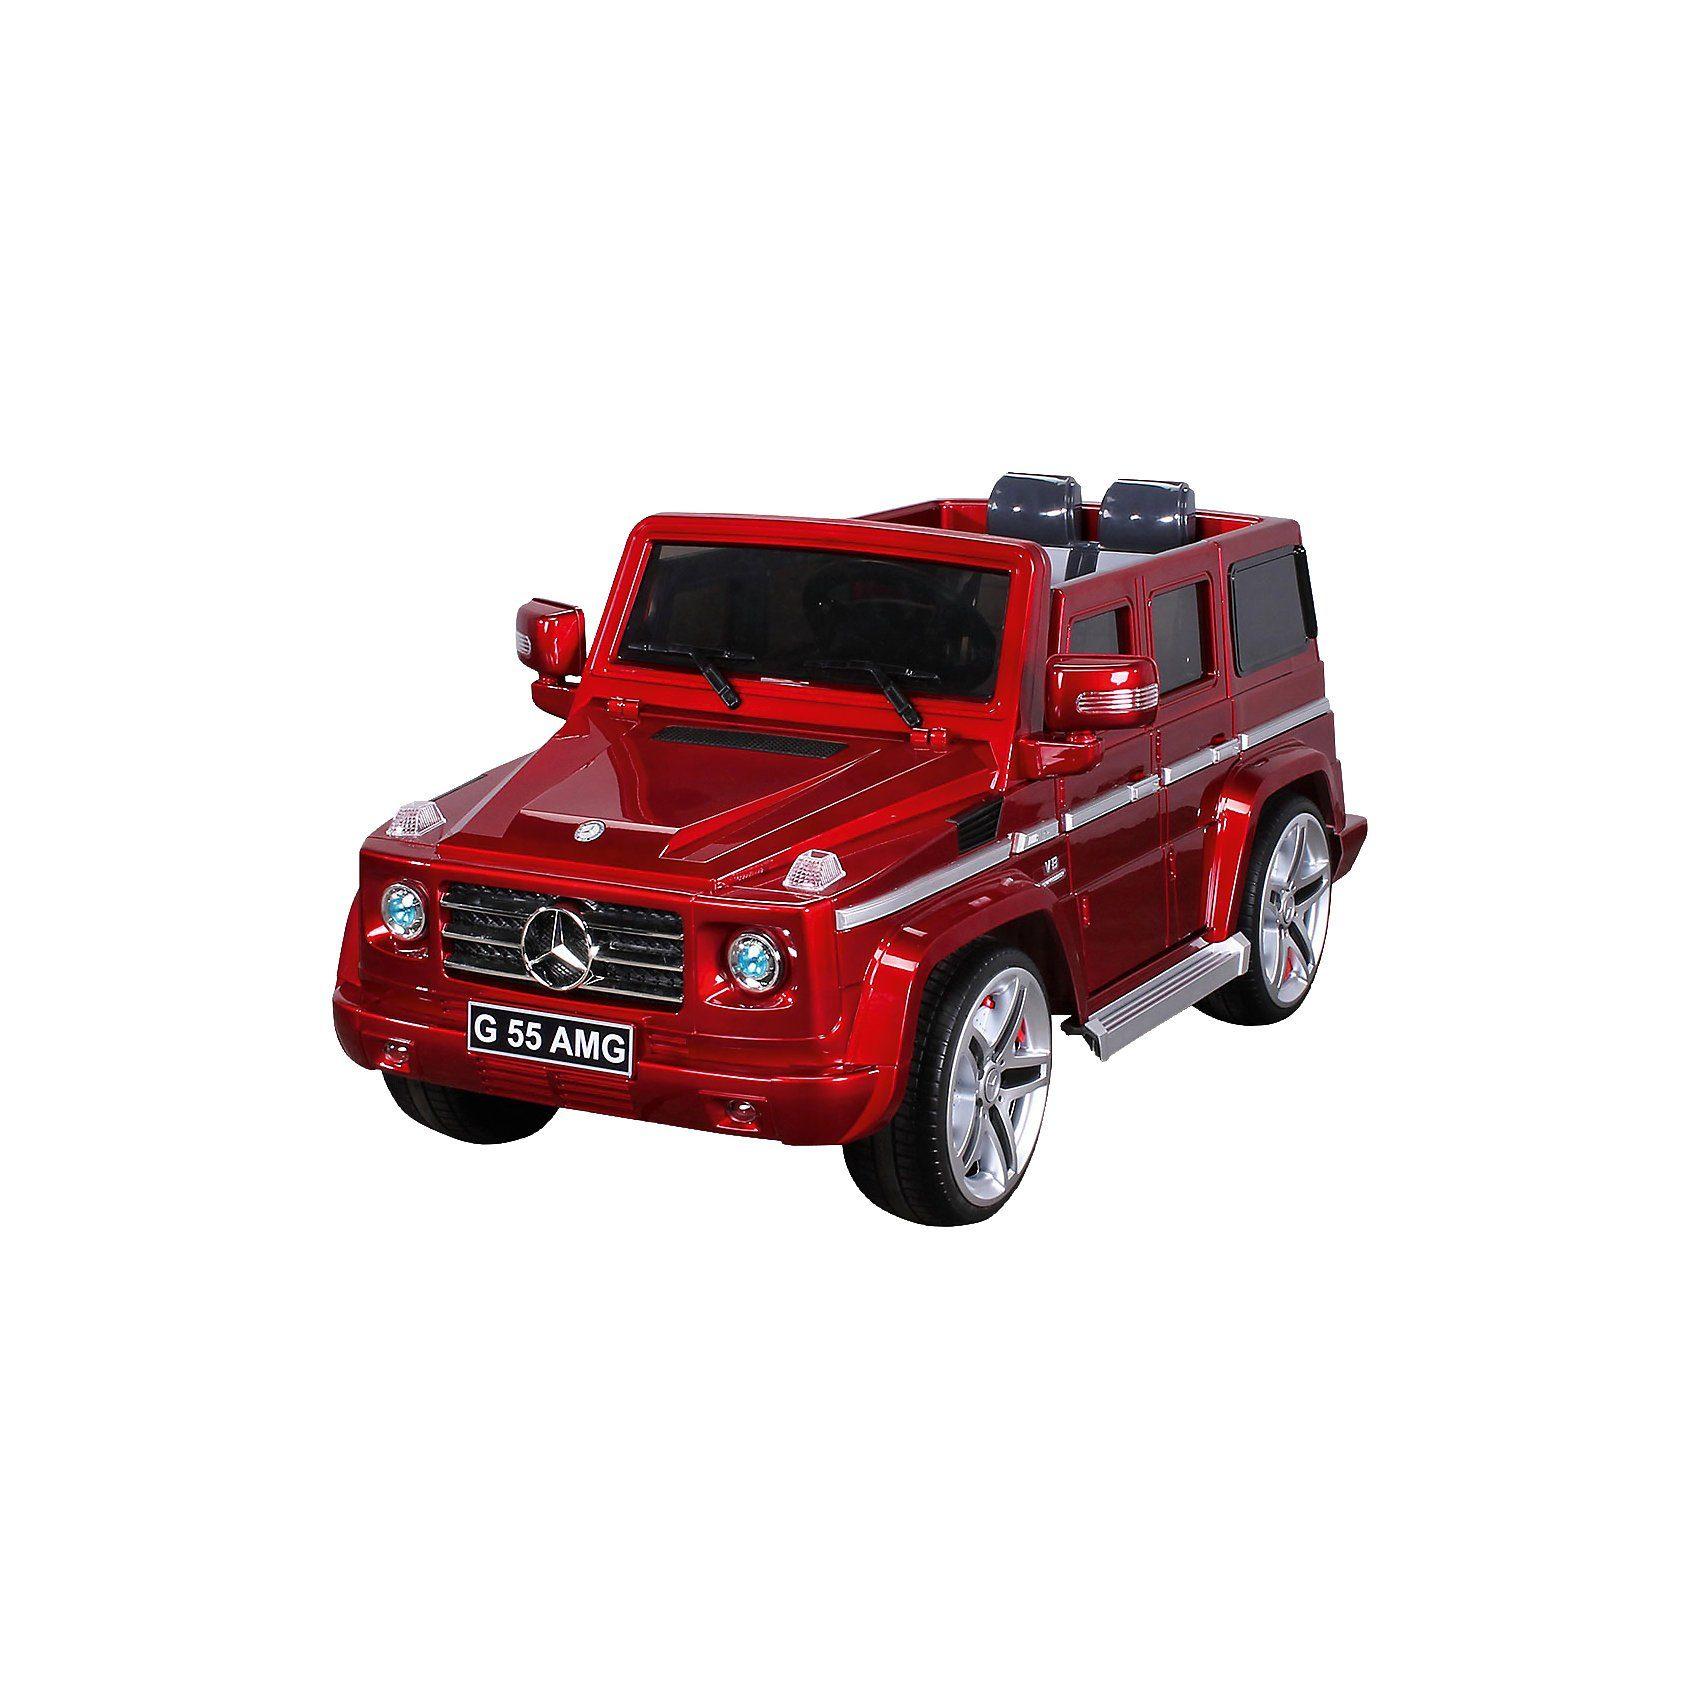 miweba Kinder Elektroauto Mercedes G55 AMG Lizenziert, rot